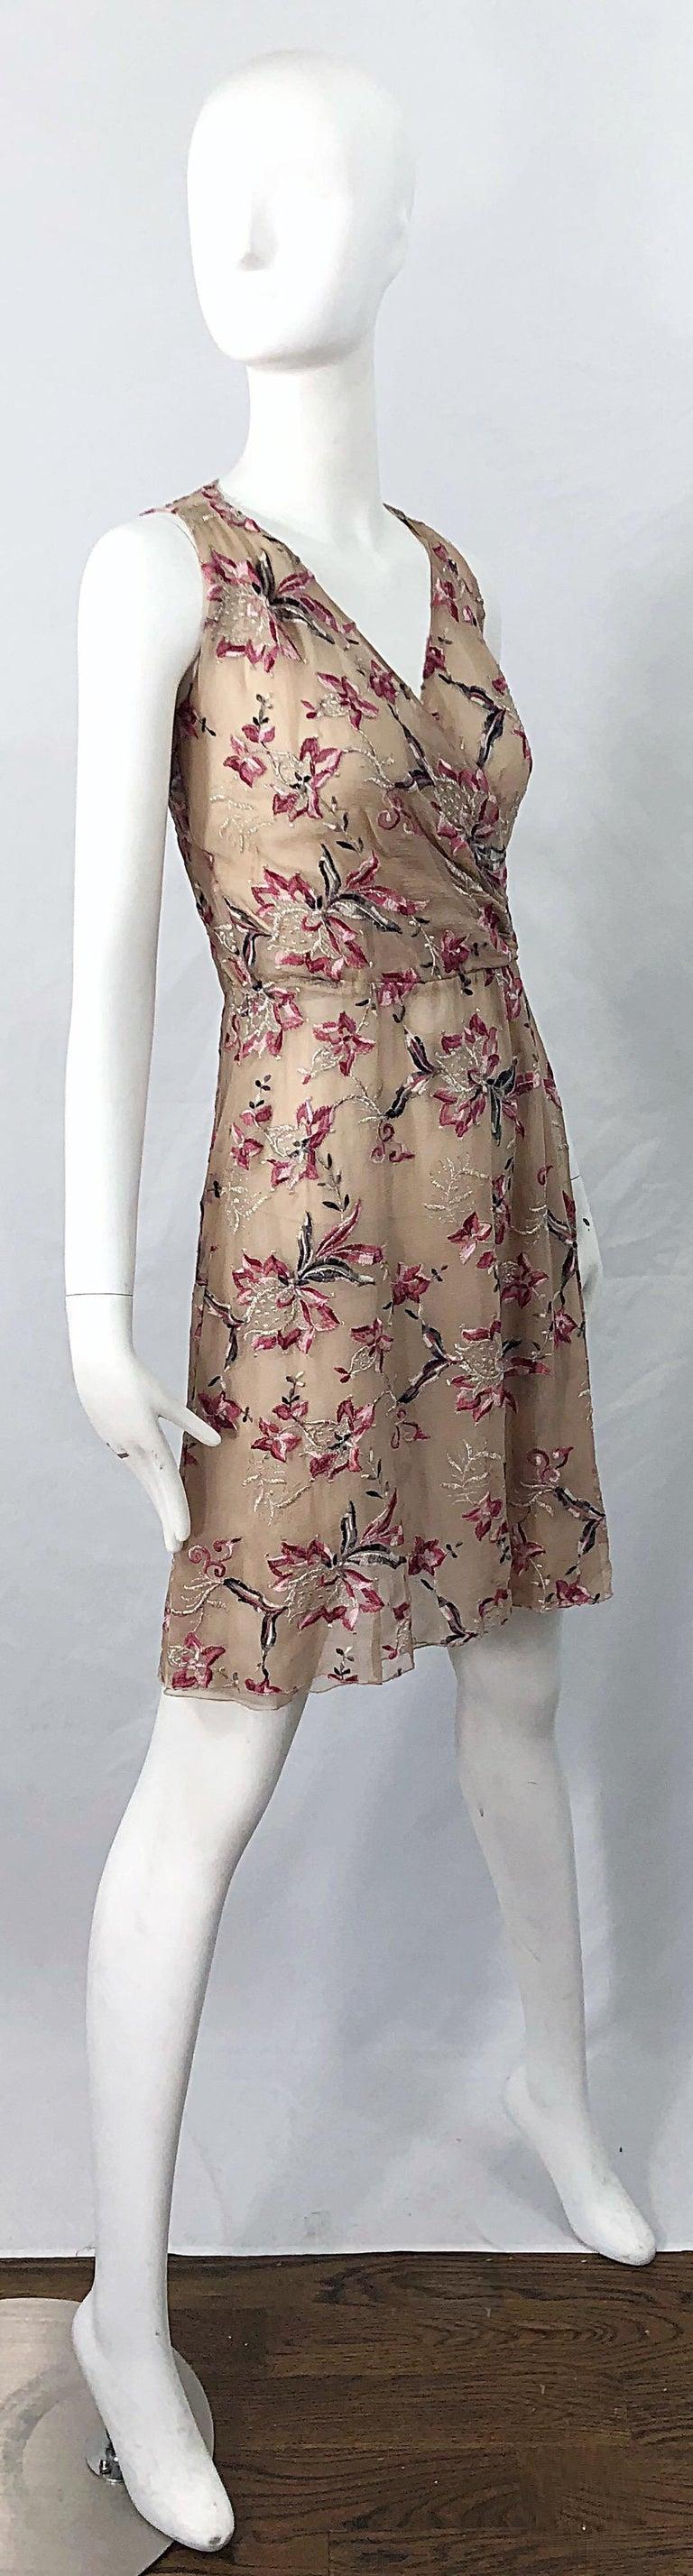 Beautiful 1990s Valentino Nude Silk Chiffon Semi Sheer Size 6 Embroidered Dress For Sale 8